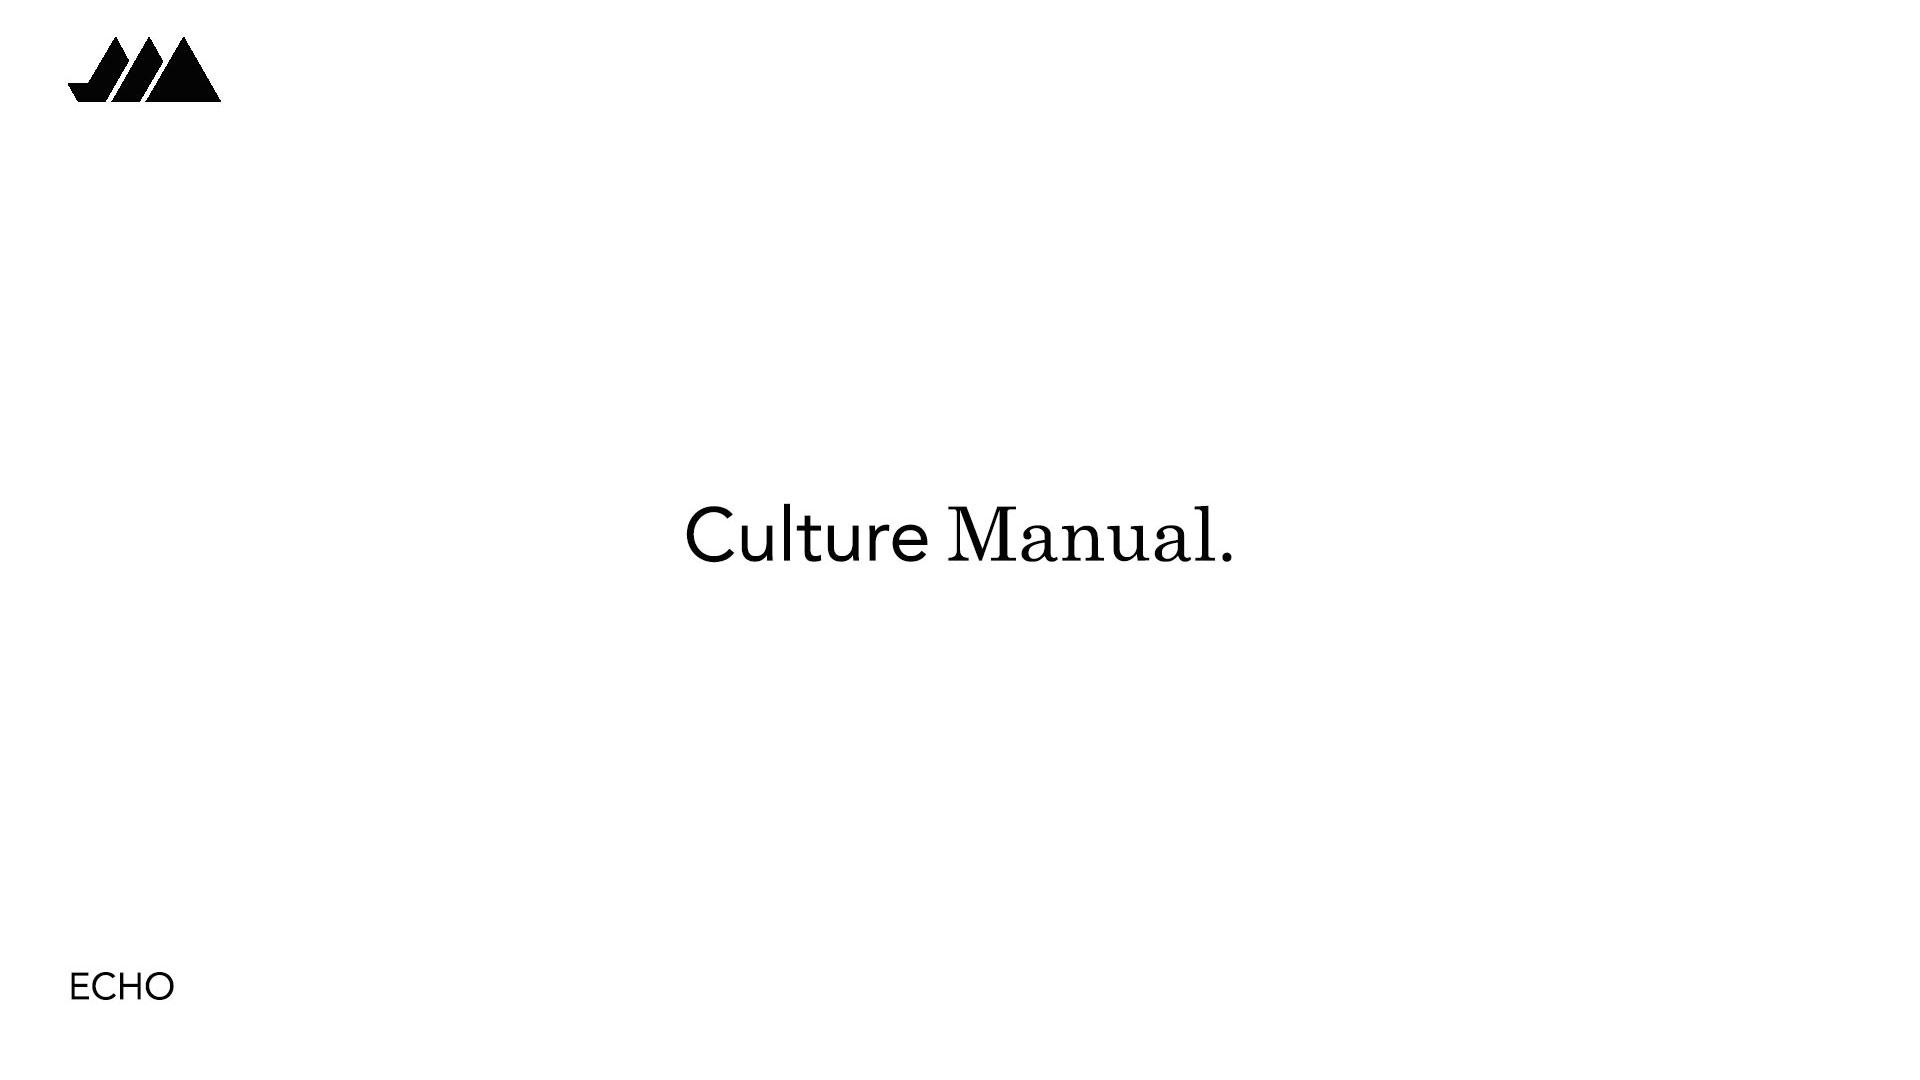 Series: Culture Manual